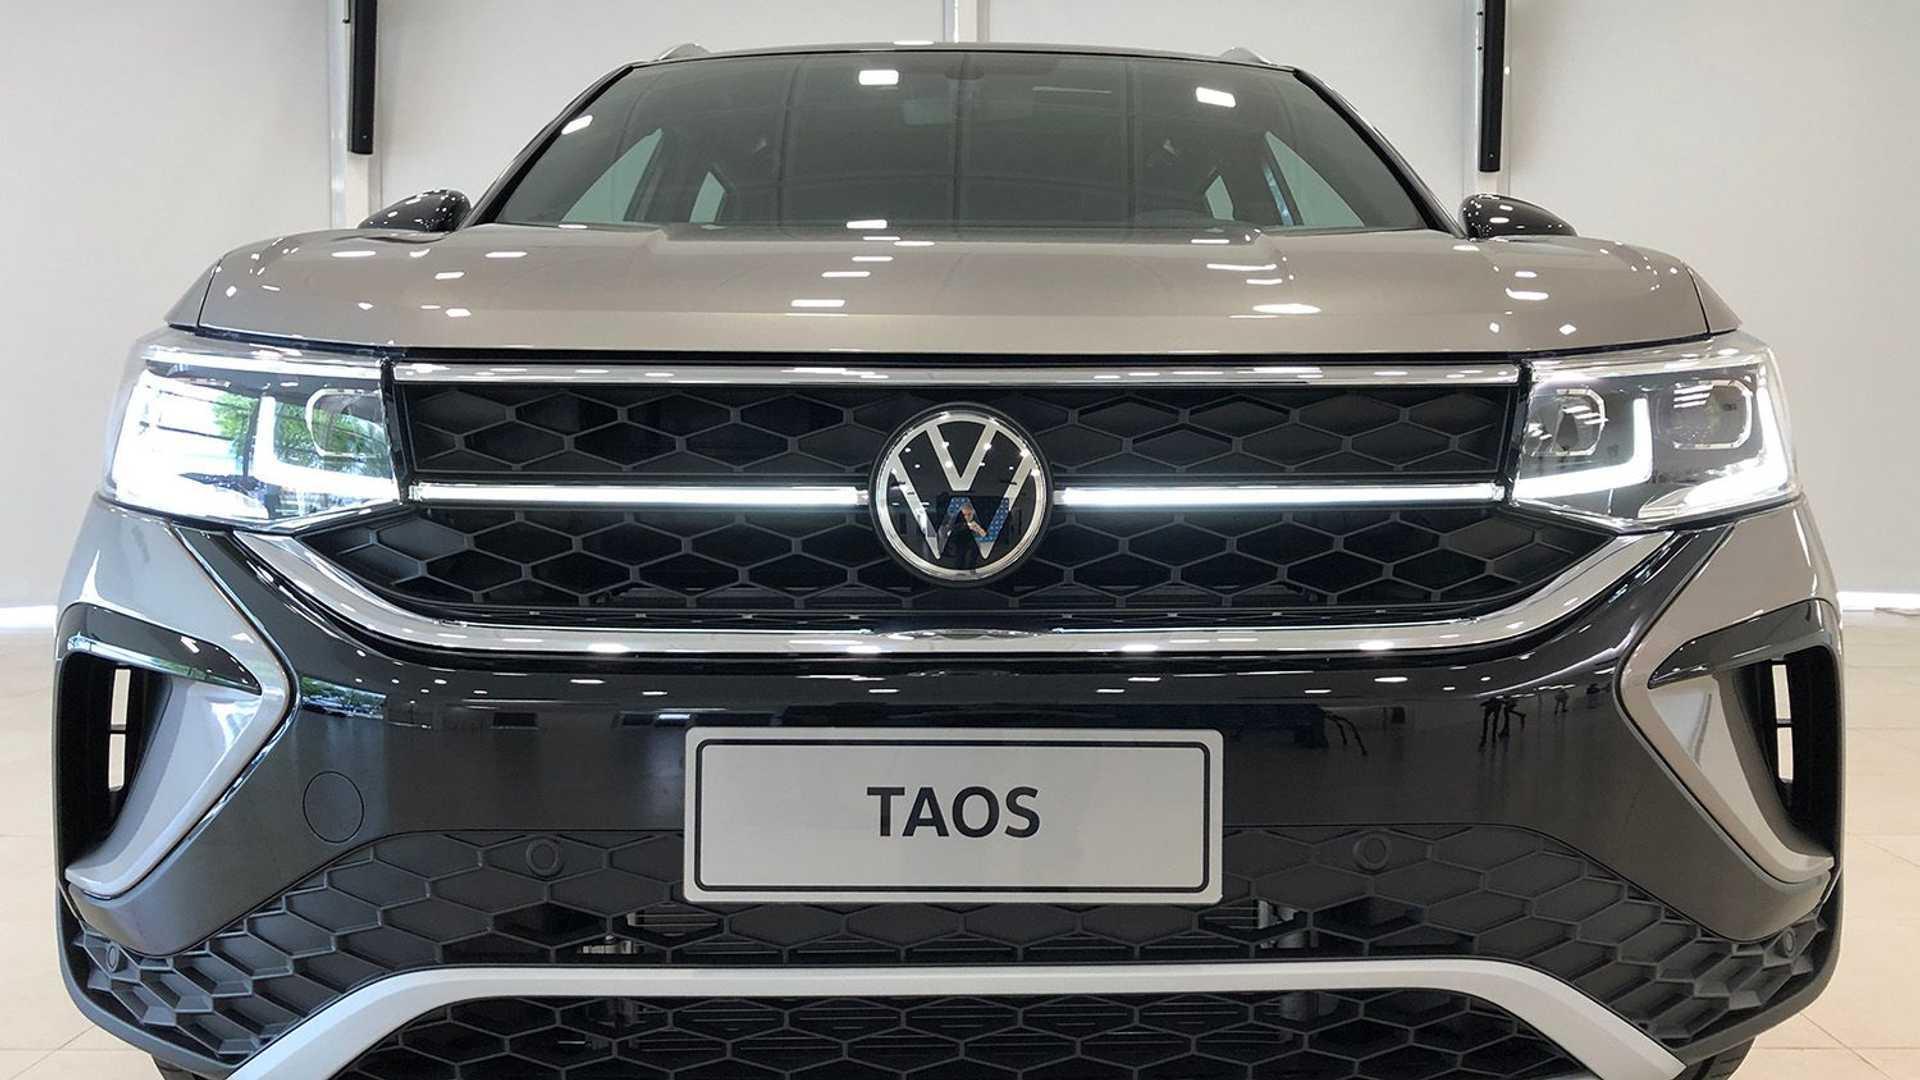 VW Taos 2022 (fotos ao vivo na Argentina)